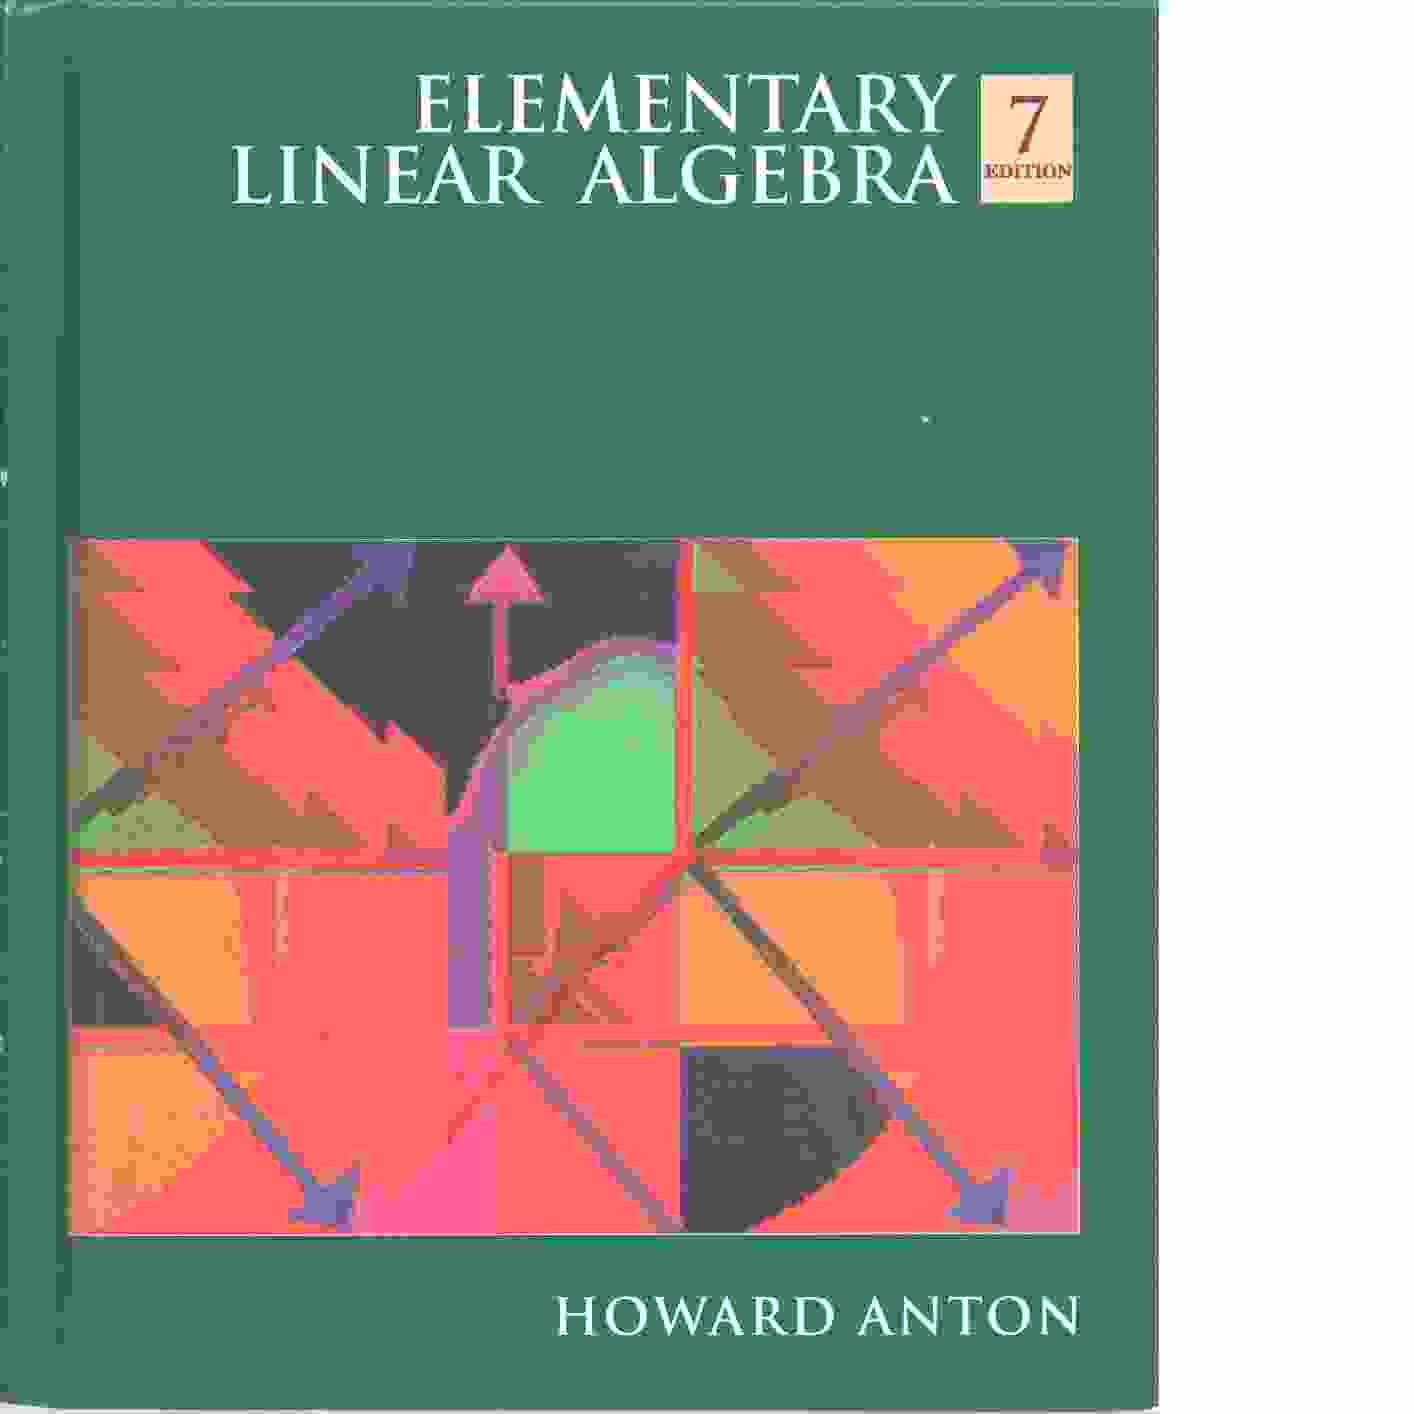 Elementary linear algebra, 7 edition - Anton, Howard